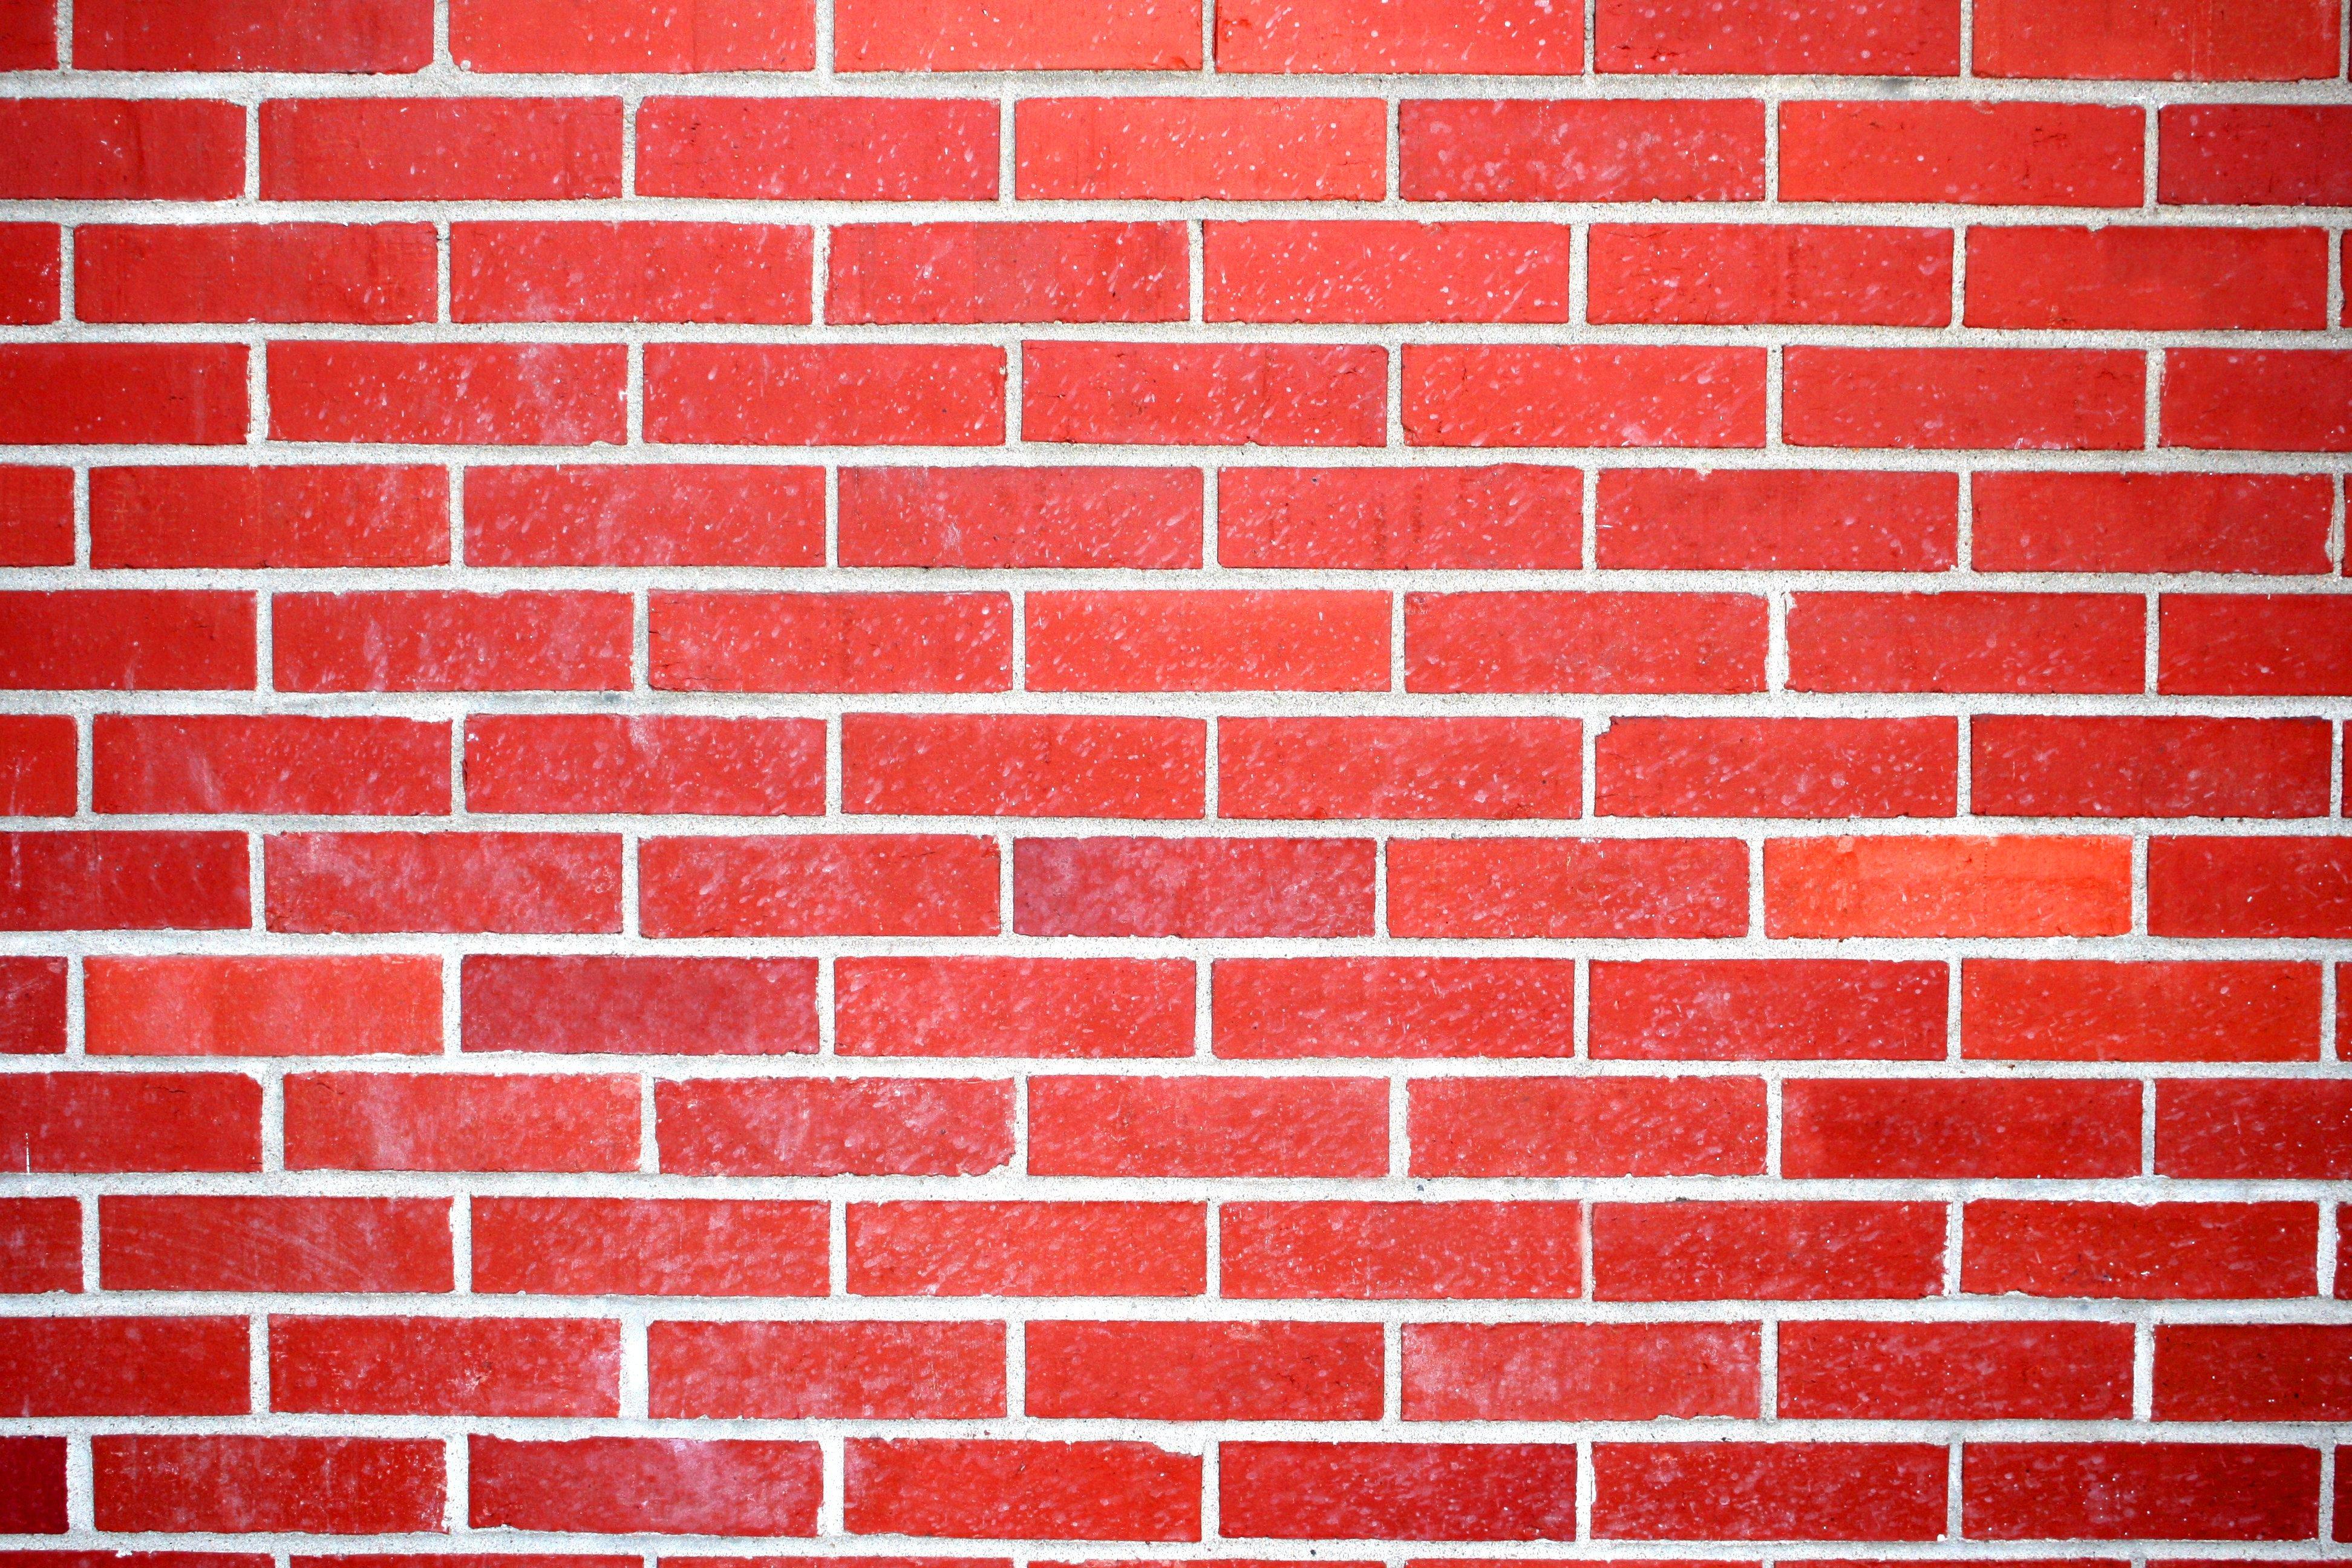 Brick clipart briks. Bright red wall texture